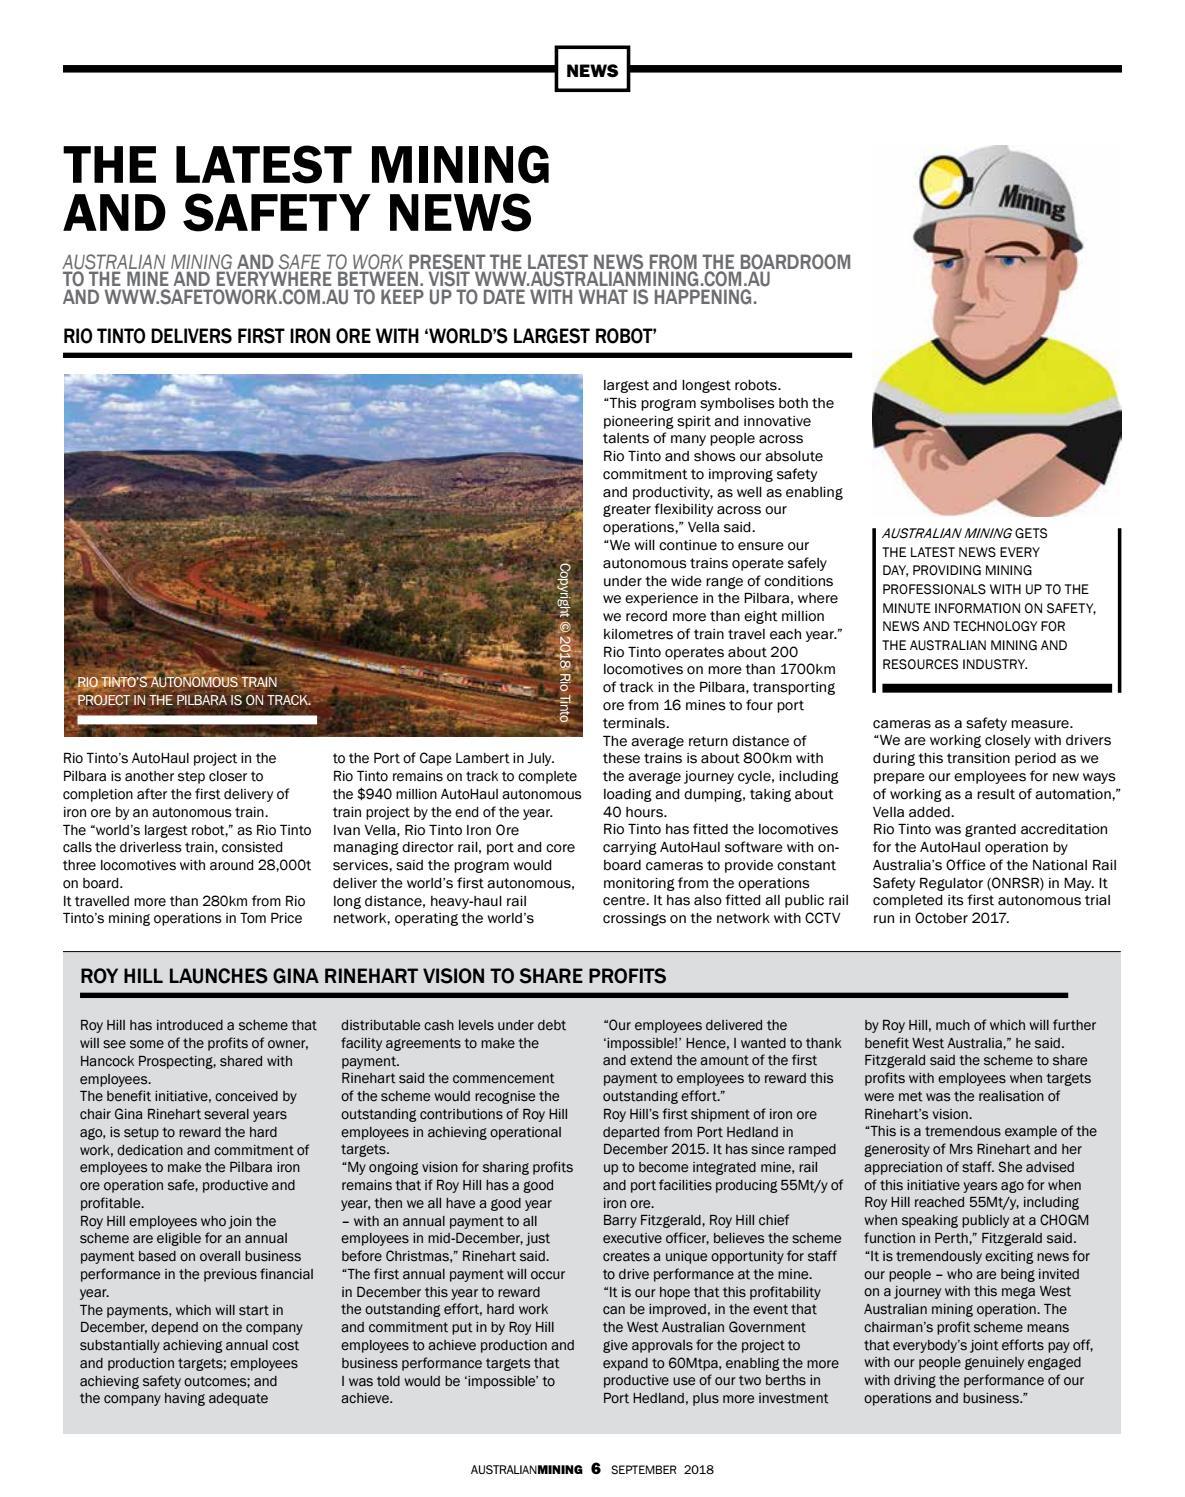 Australian Mining - Sep 2018